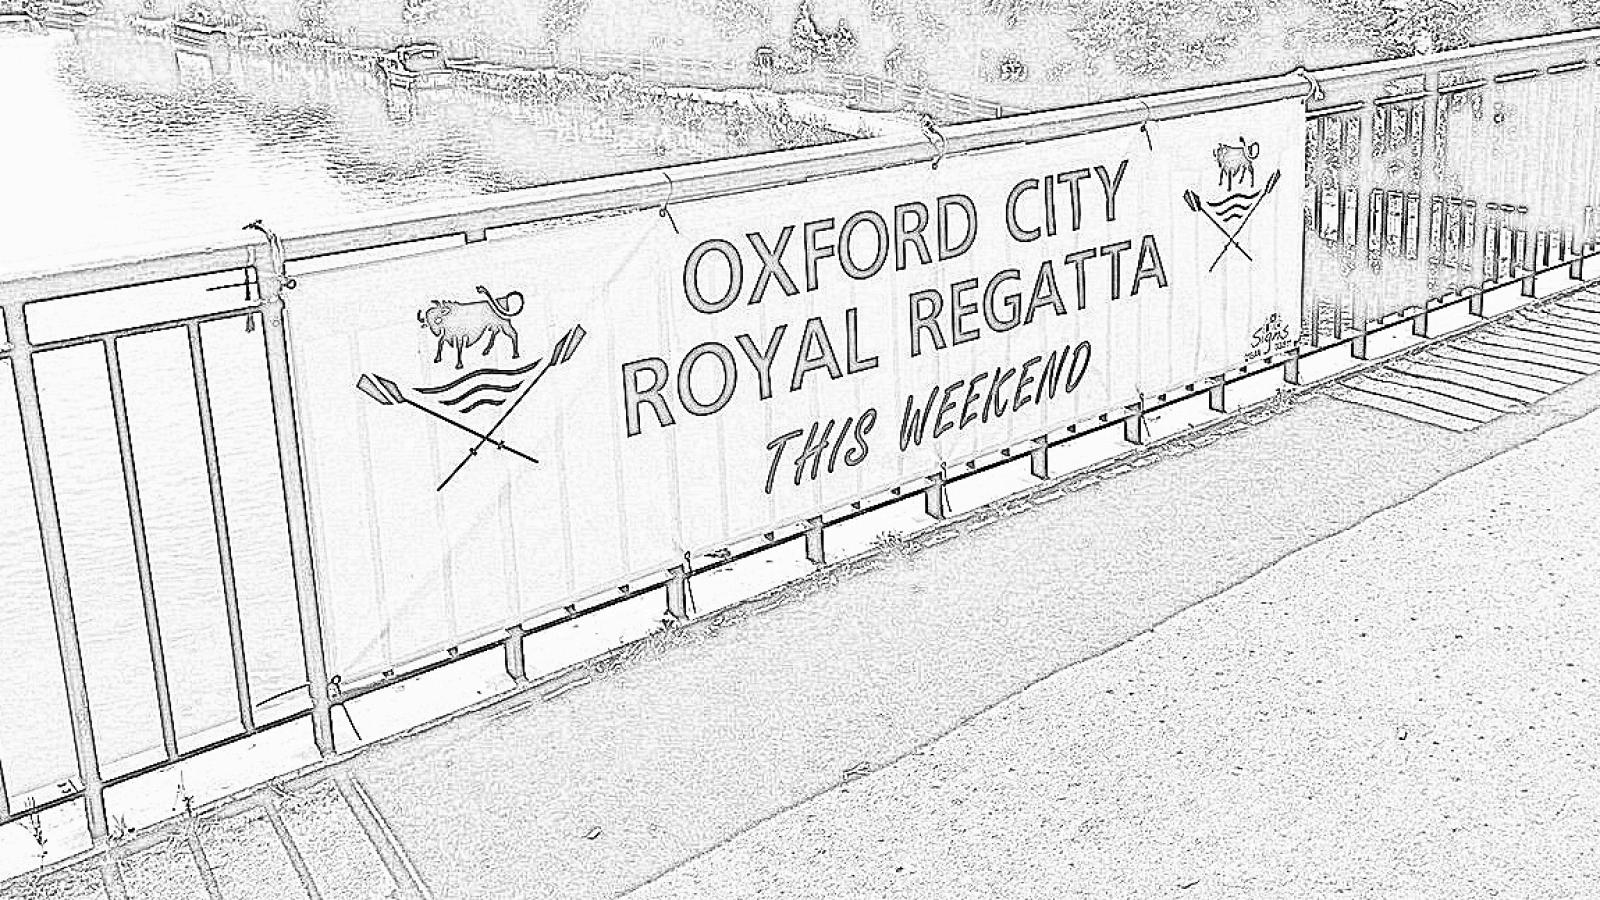 Oxford City Royal Regatta 2019